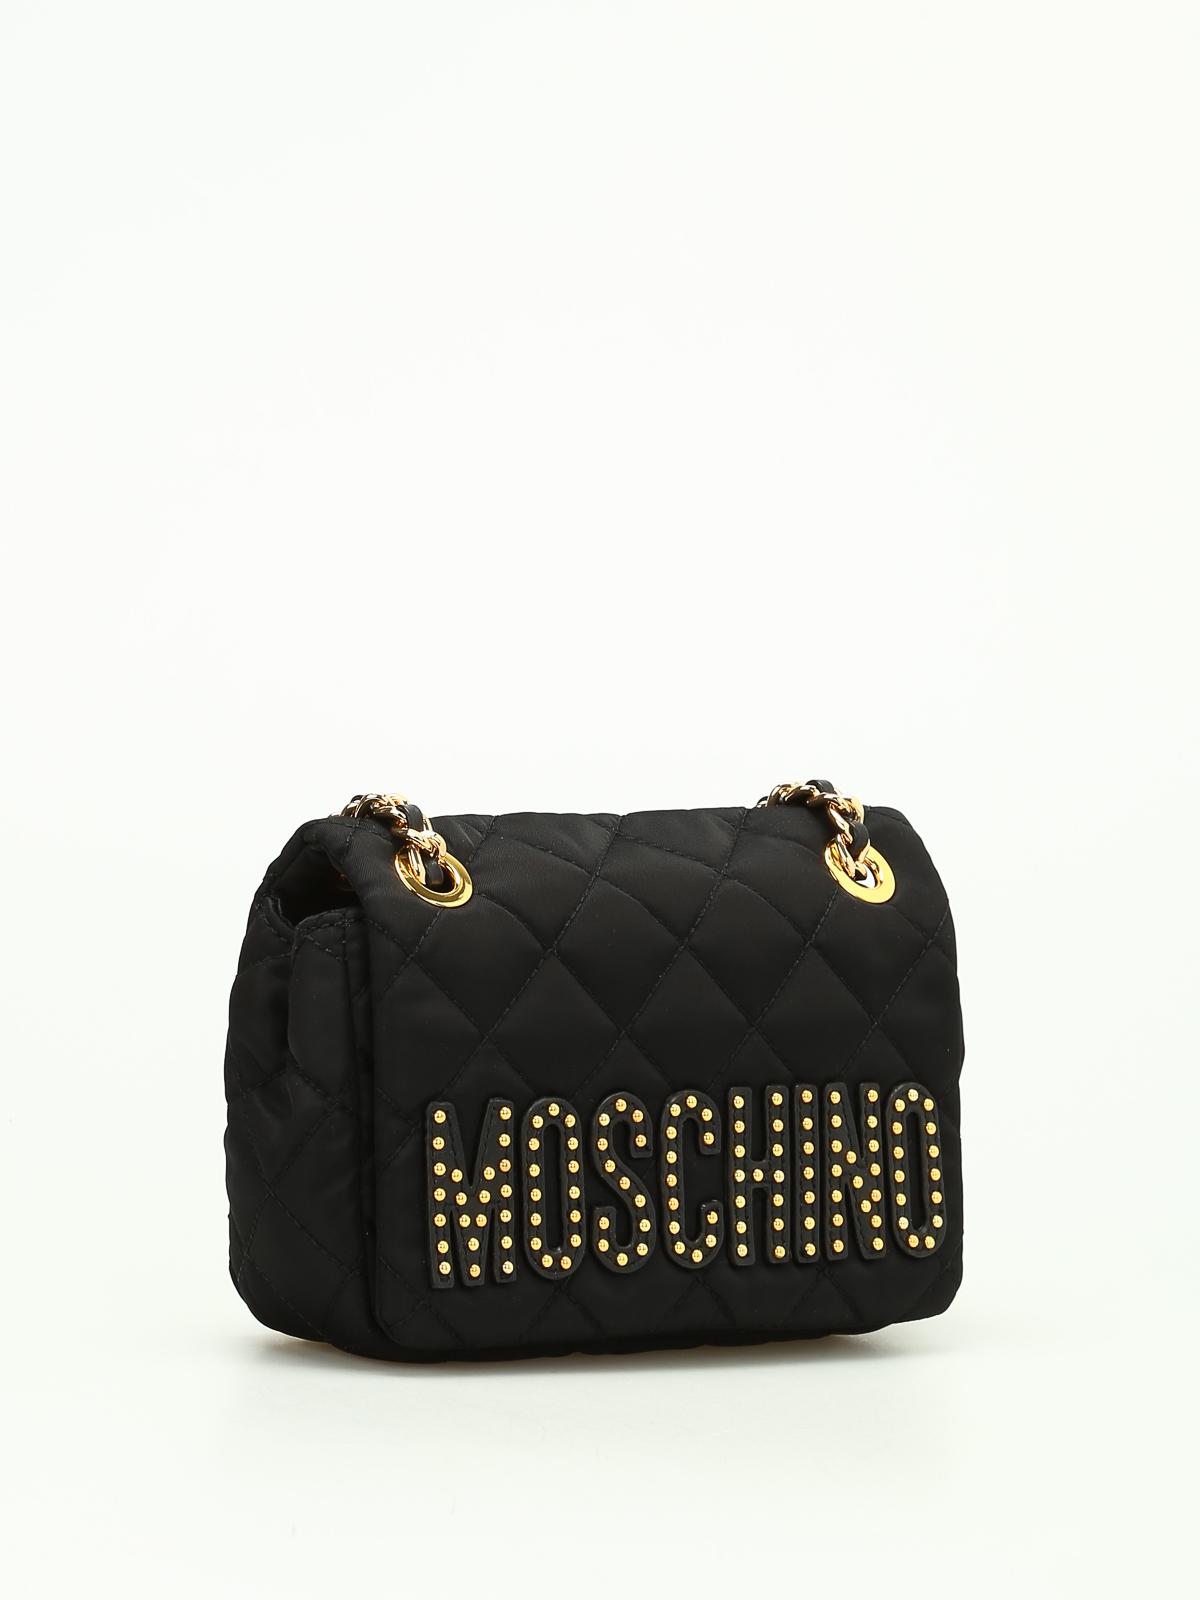 Moschino Quilted Nylon Shoulder Bag Shoulder Bags